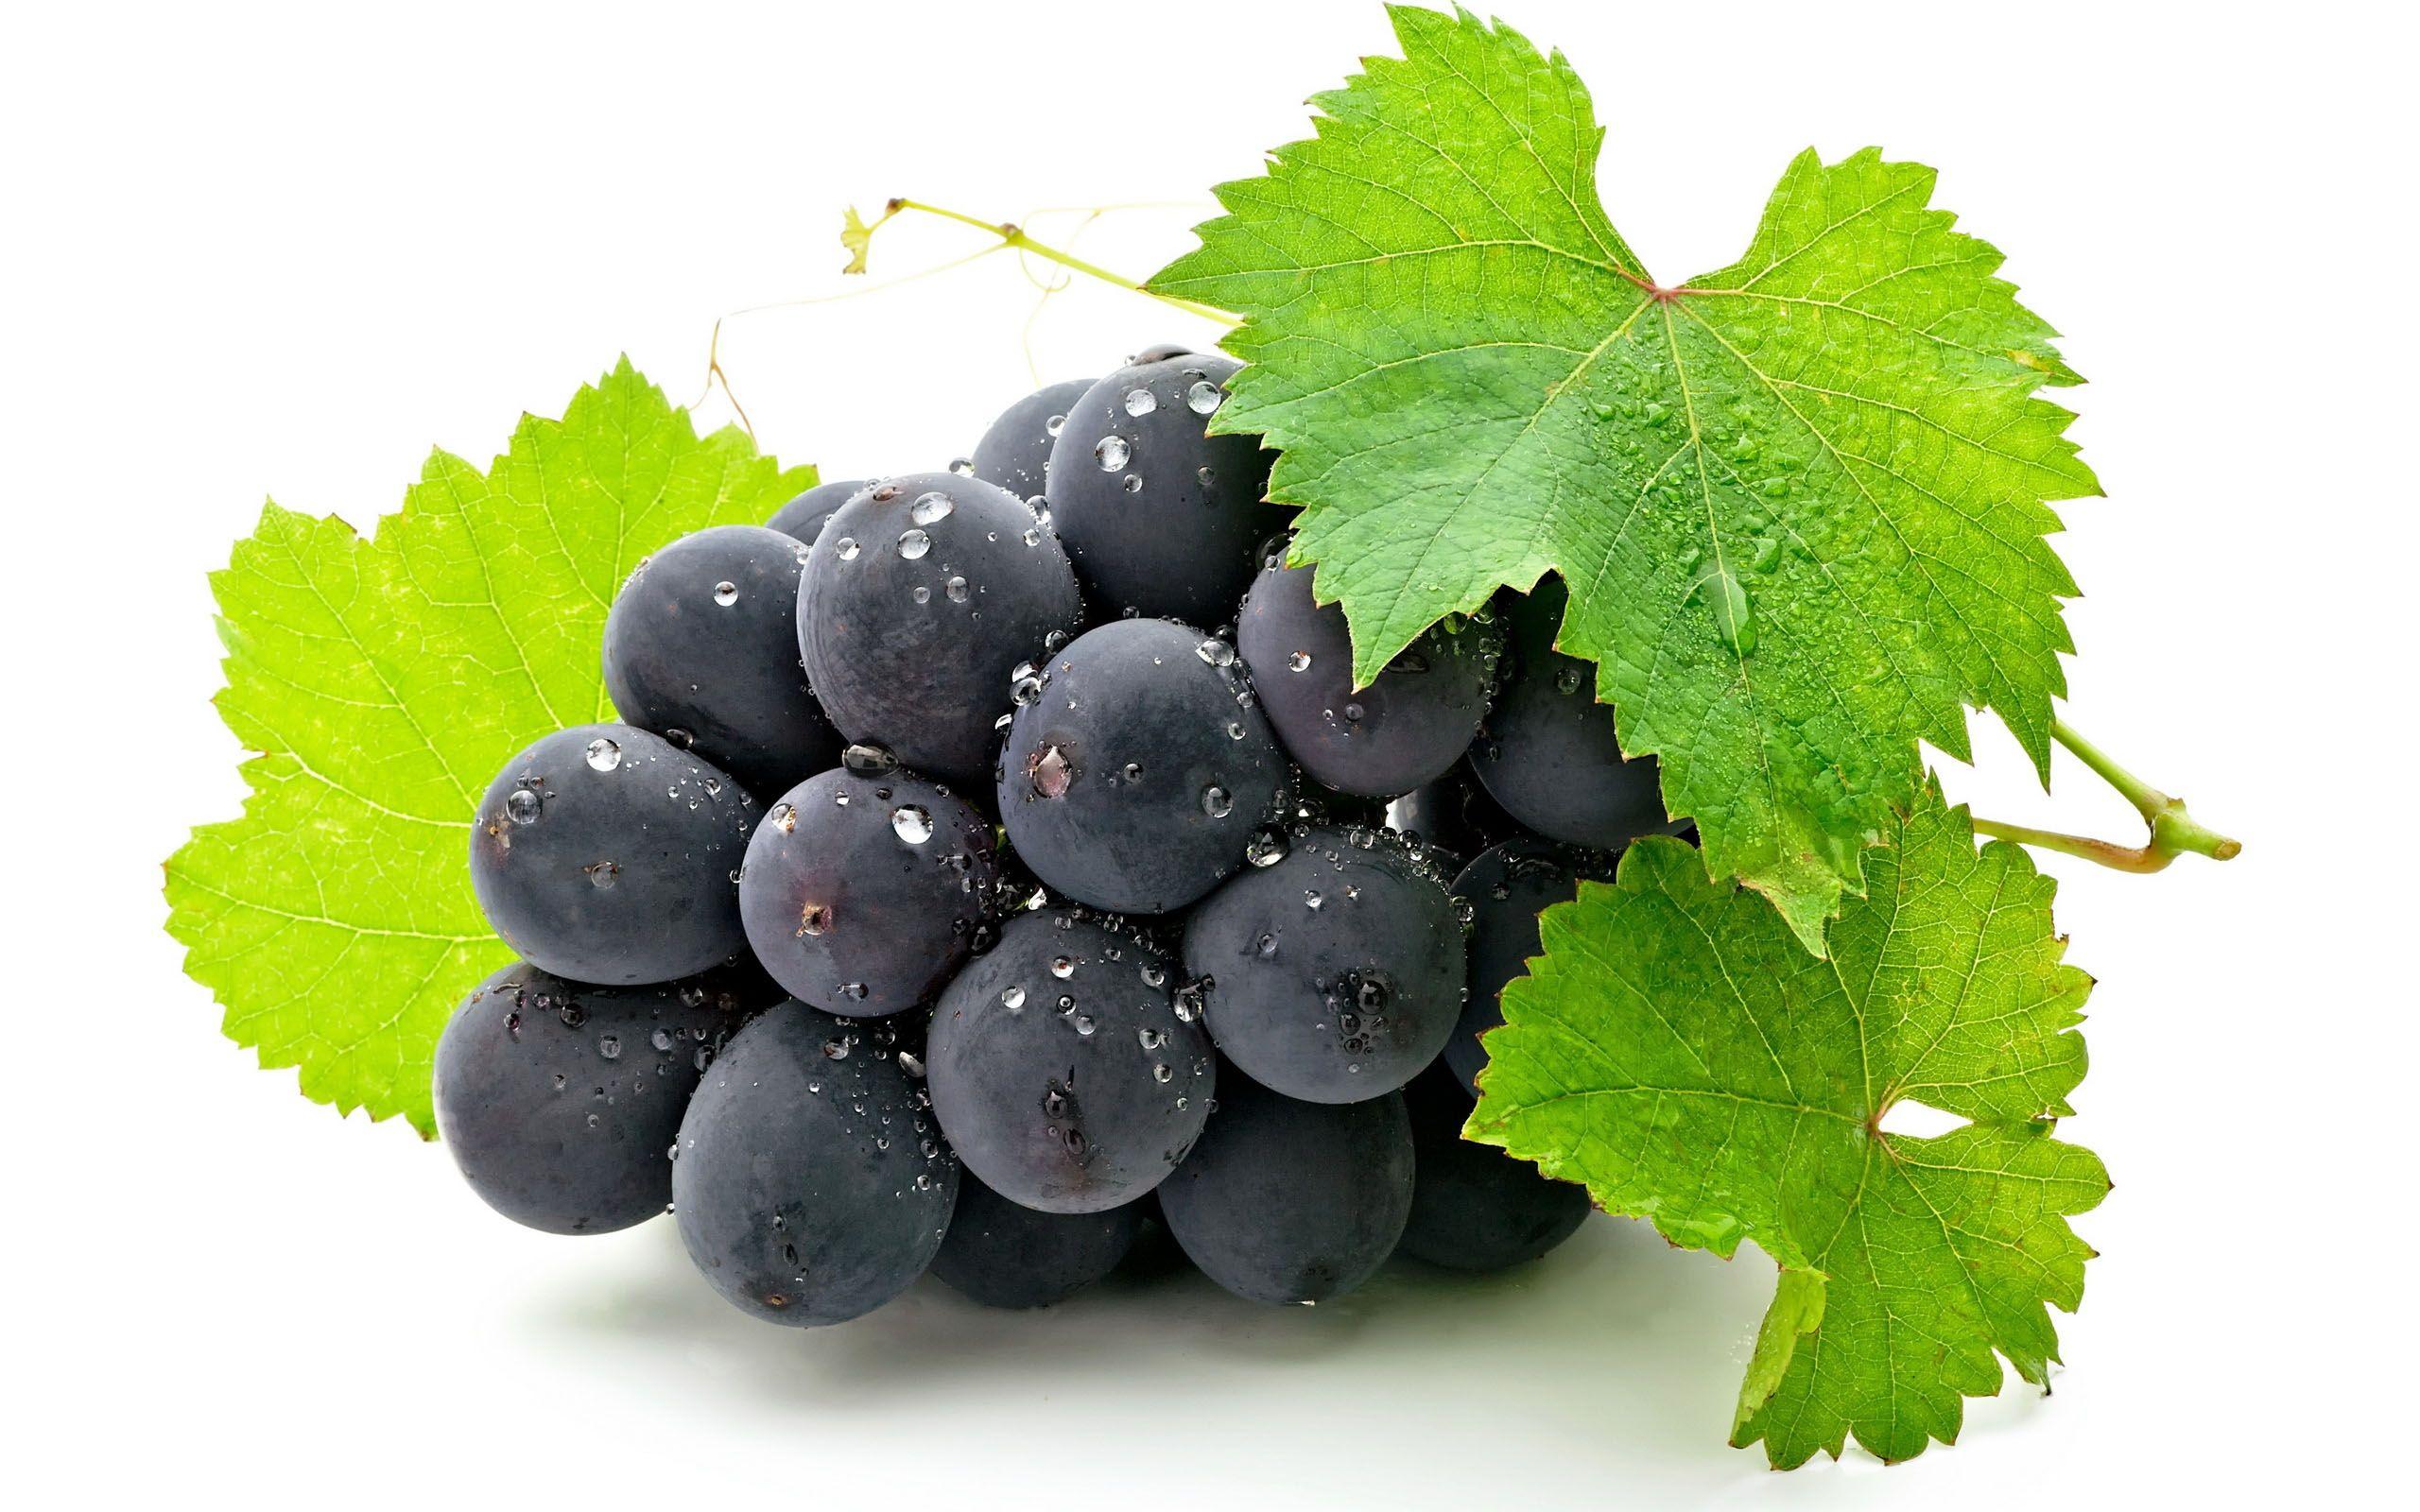 Wallpaper HD Sweet Grape Fruits My Favorite ones Sugared 2560x1600